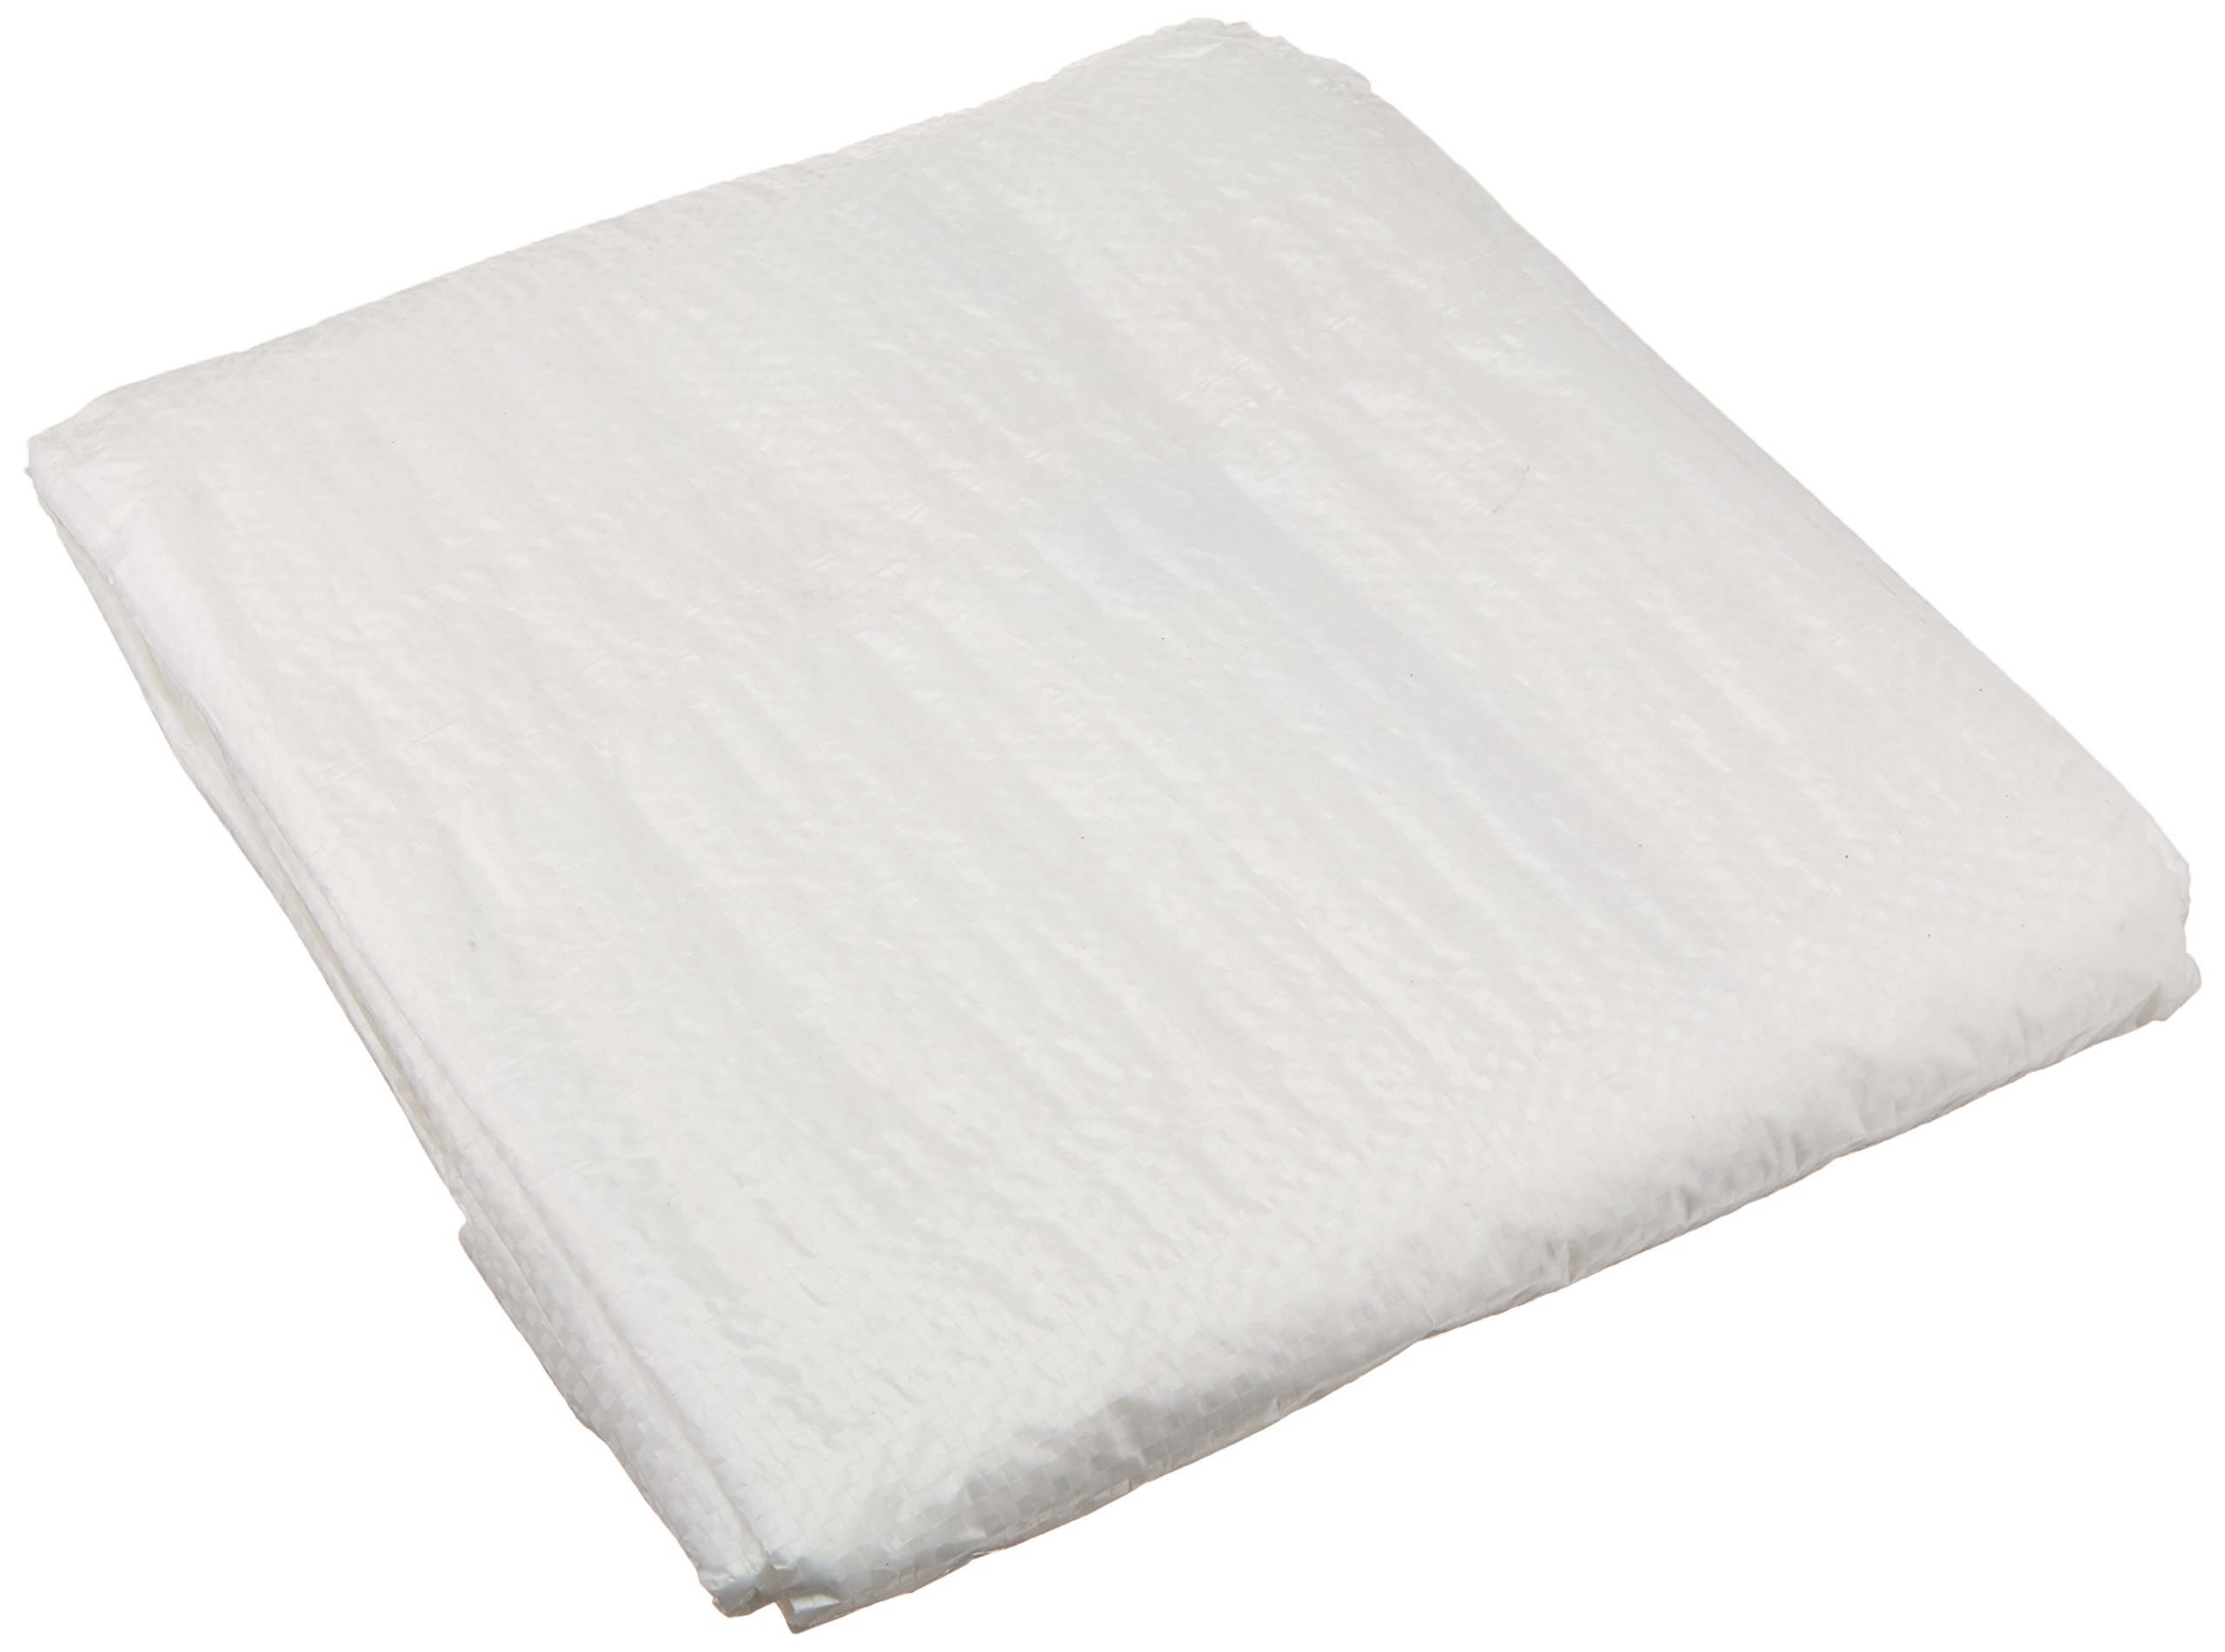 Erickson 57062 Clear White Economy Grade Poly Tarp, 10' x 12', 1 Pack